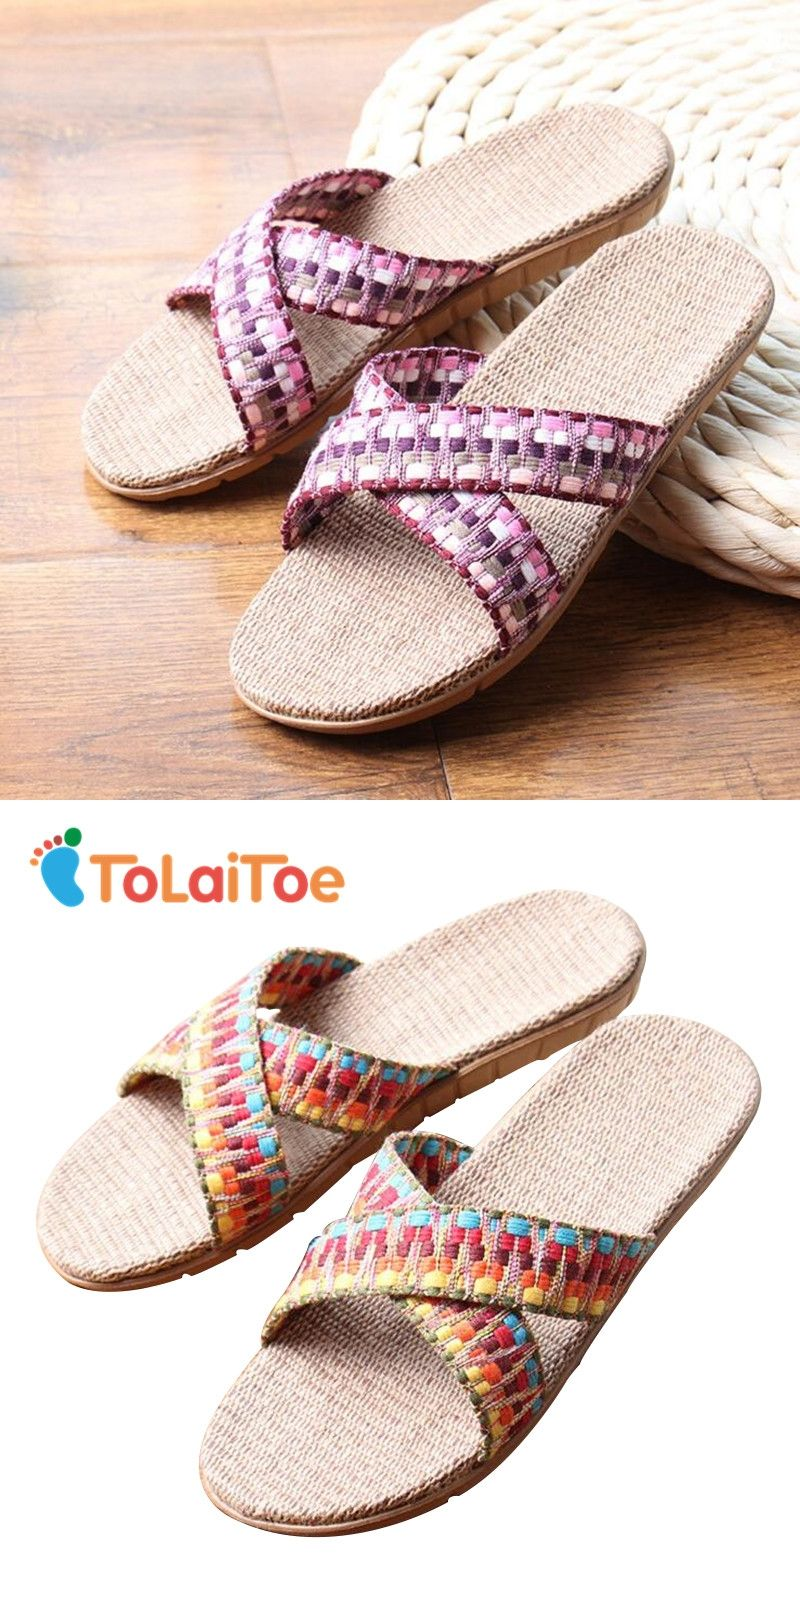 abebf244c9f ToLaiToe Women s Fashion National Linen Home Indoor Slipper Summer Cool  Crosses Belt Silent Sweat Breathable Slipper